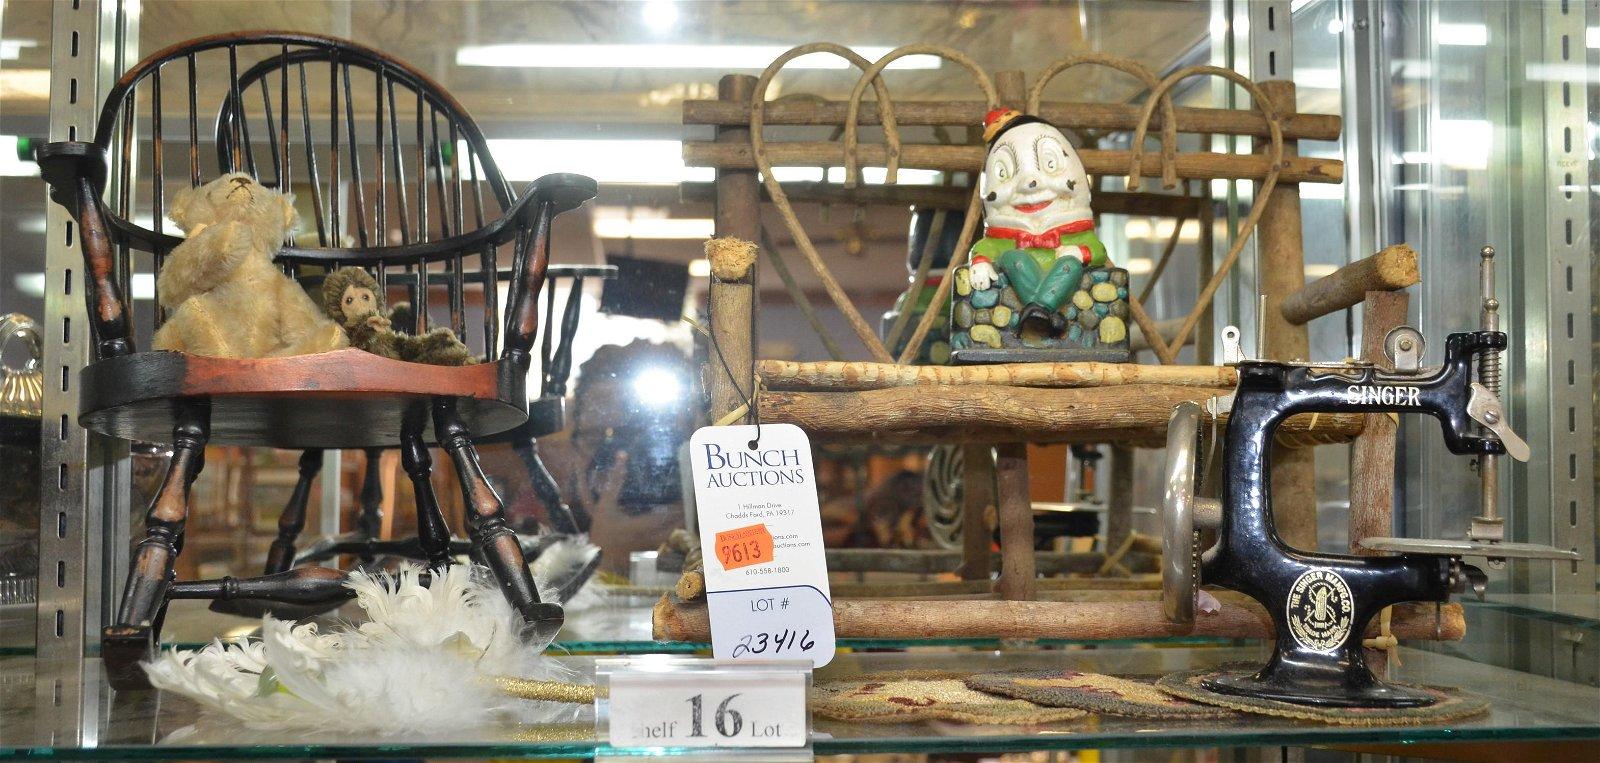 Shelf #16 - Toys & Doll Items